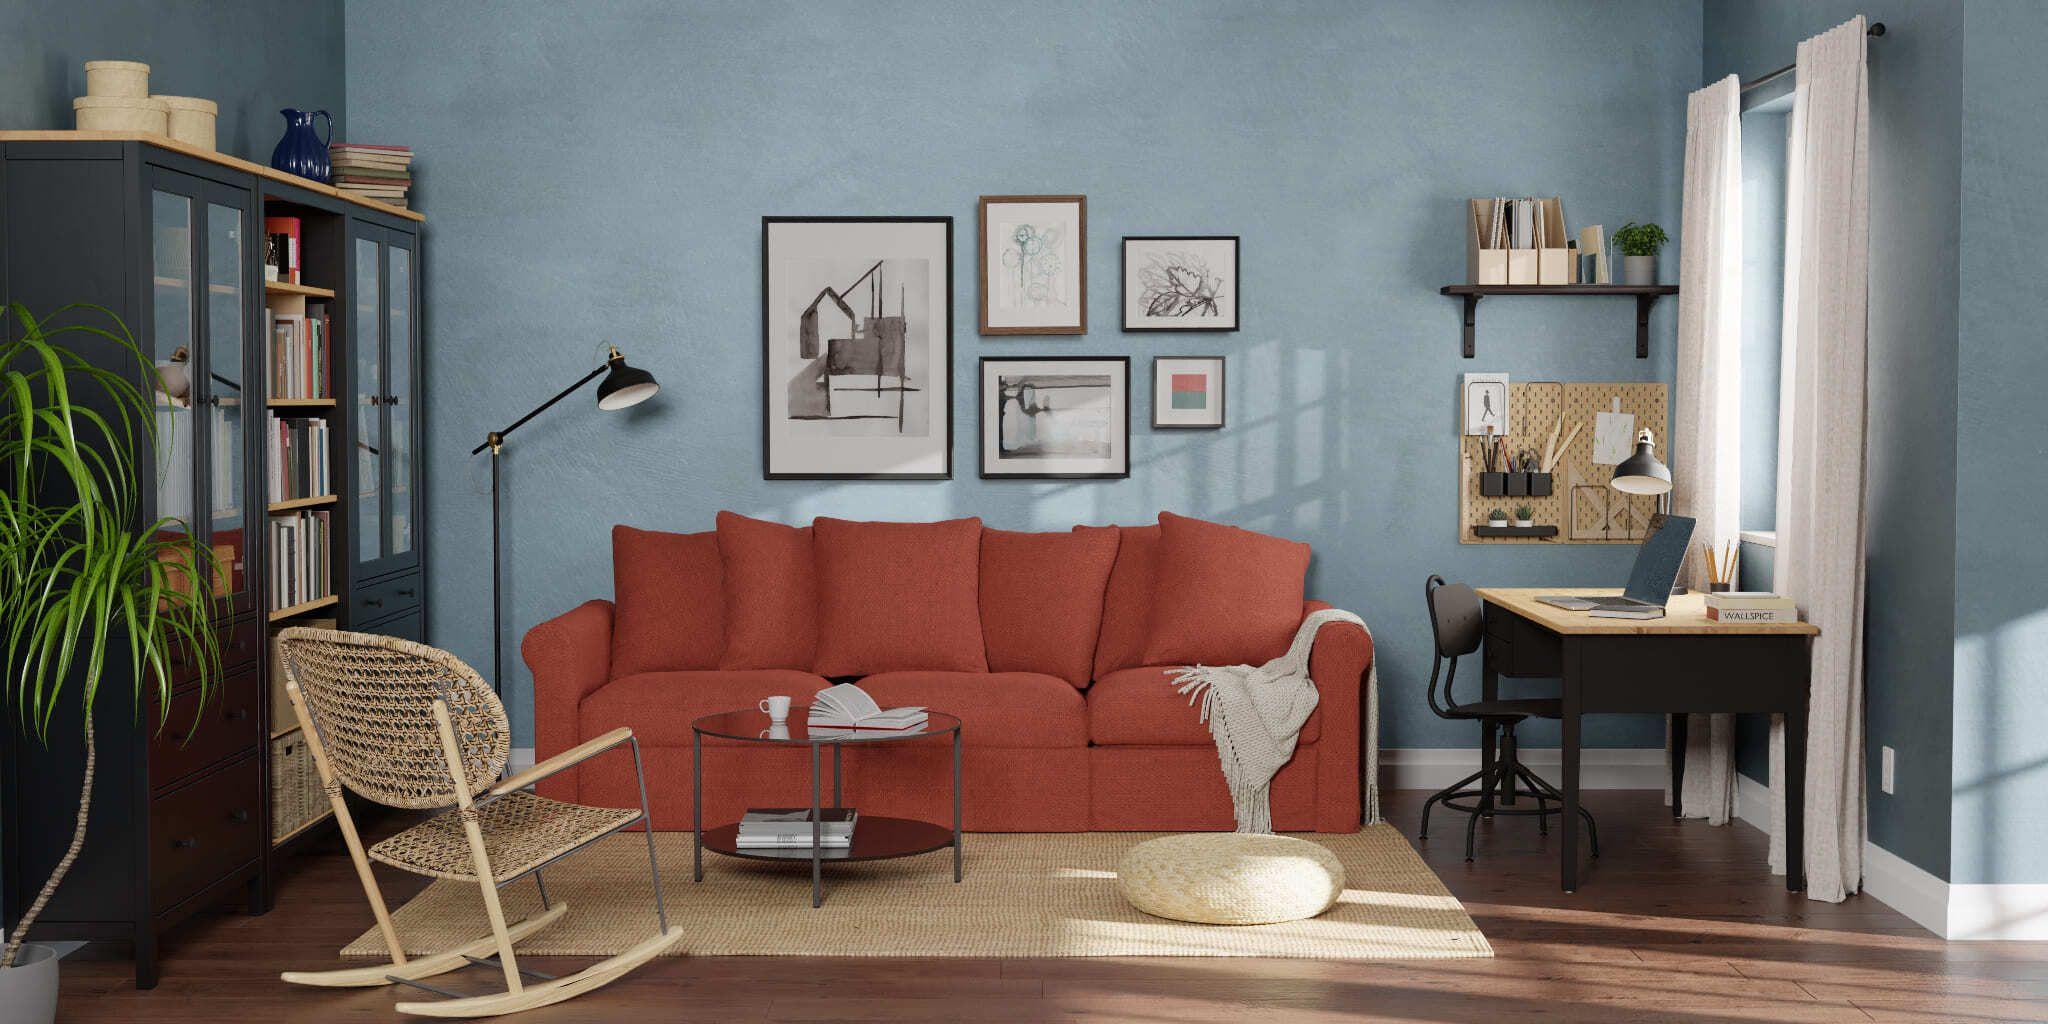 Home Furniture Decor Outdoors Shop Online Ikea In 2021 Living Room Decor Furniture Furniture Decor Room [ 1024 x 2048 Pixel ]